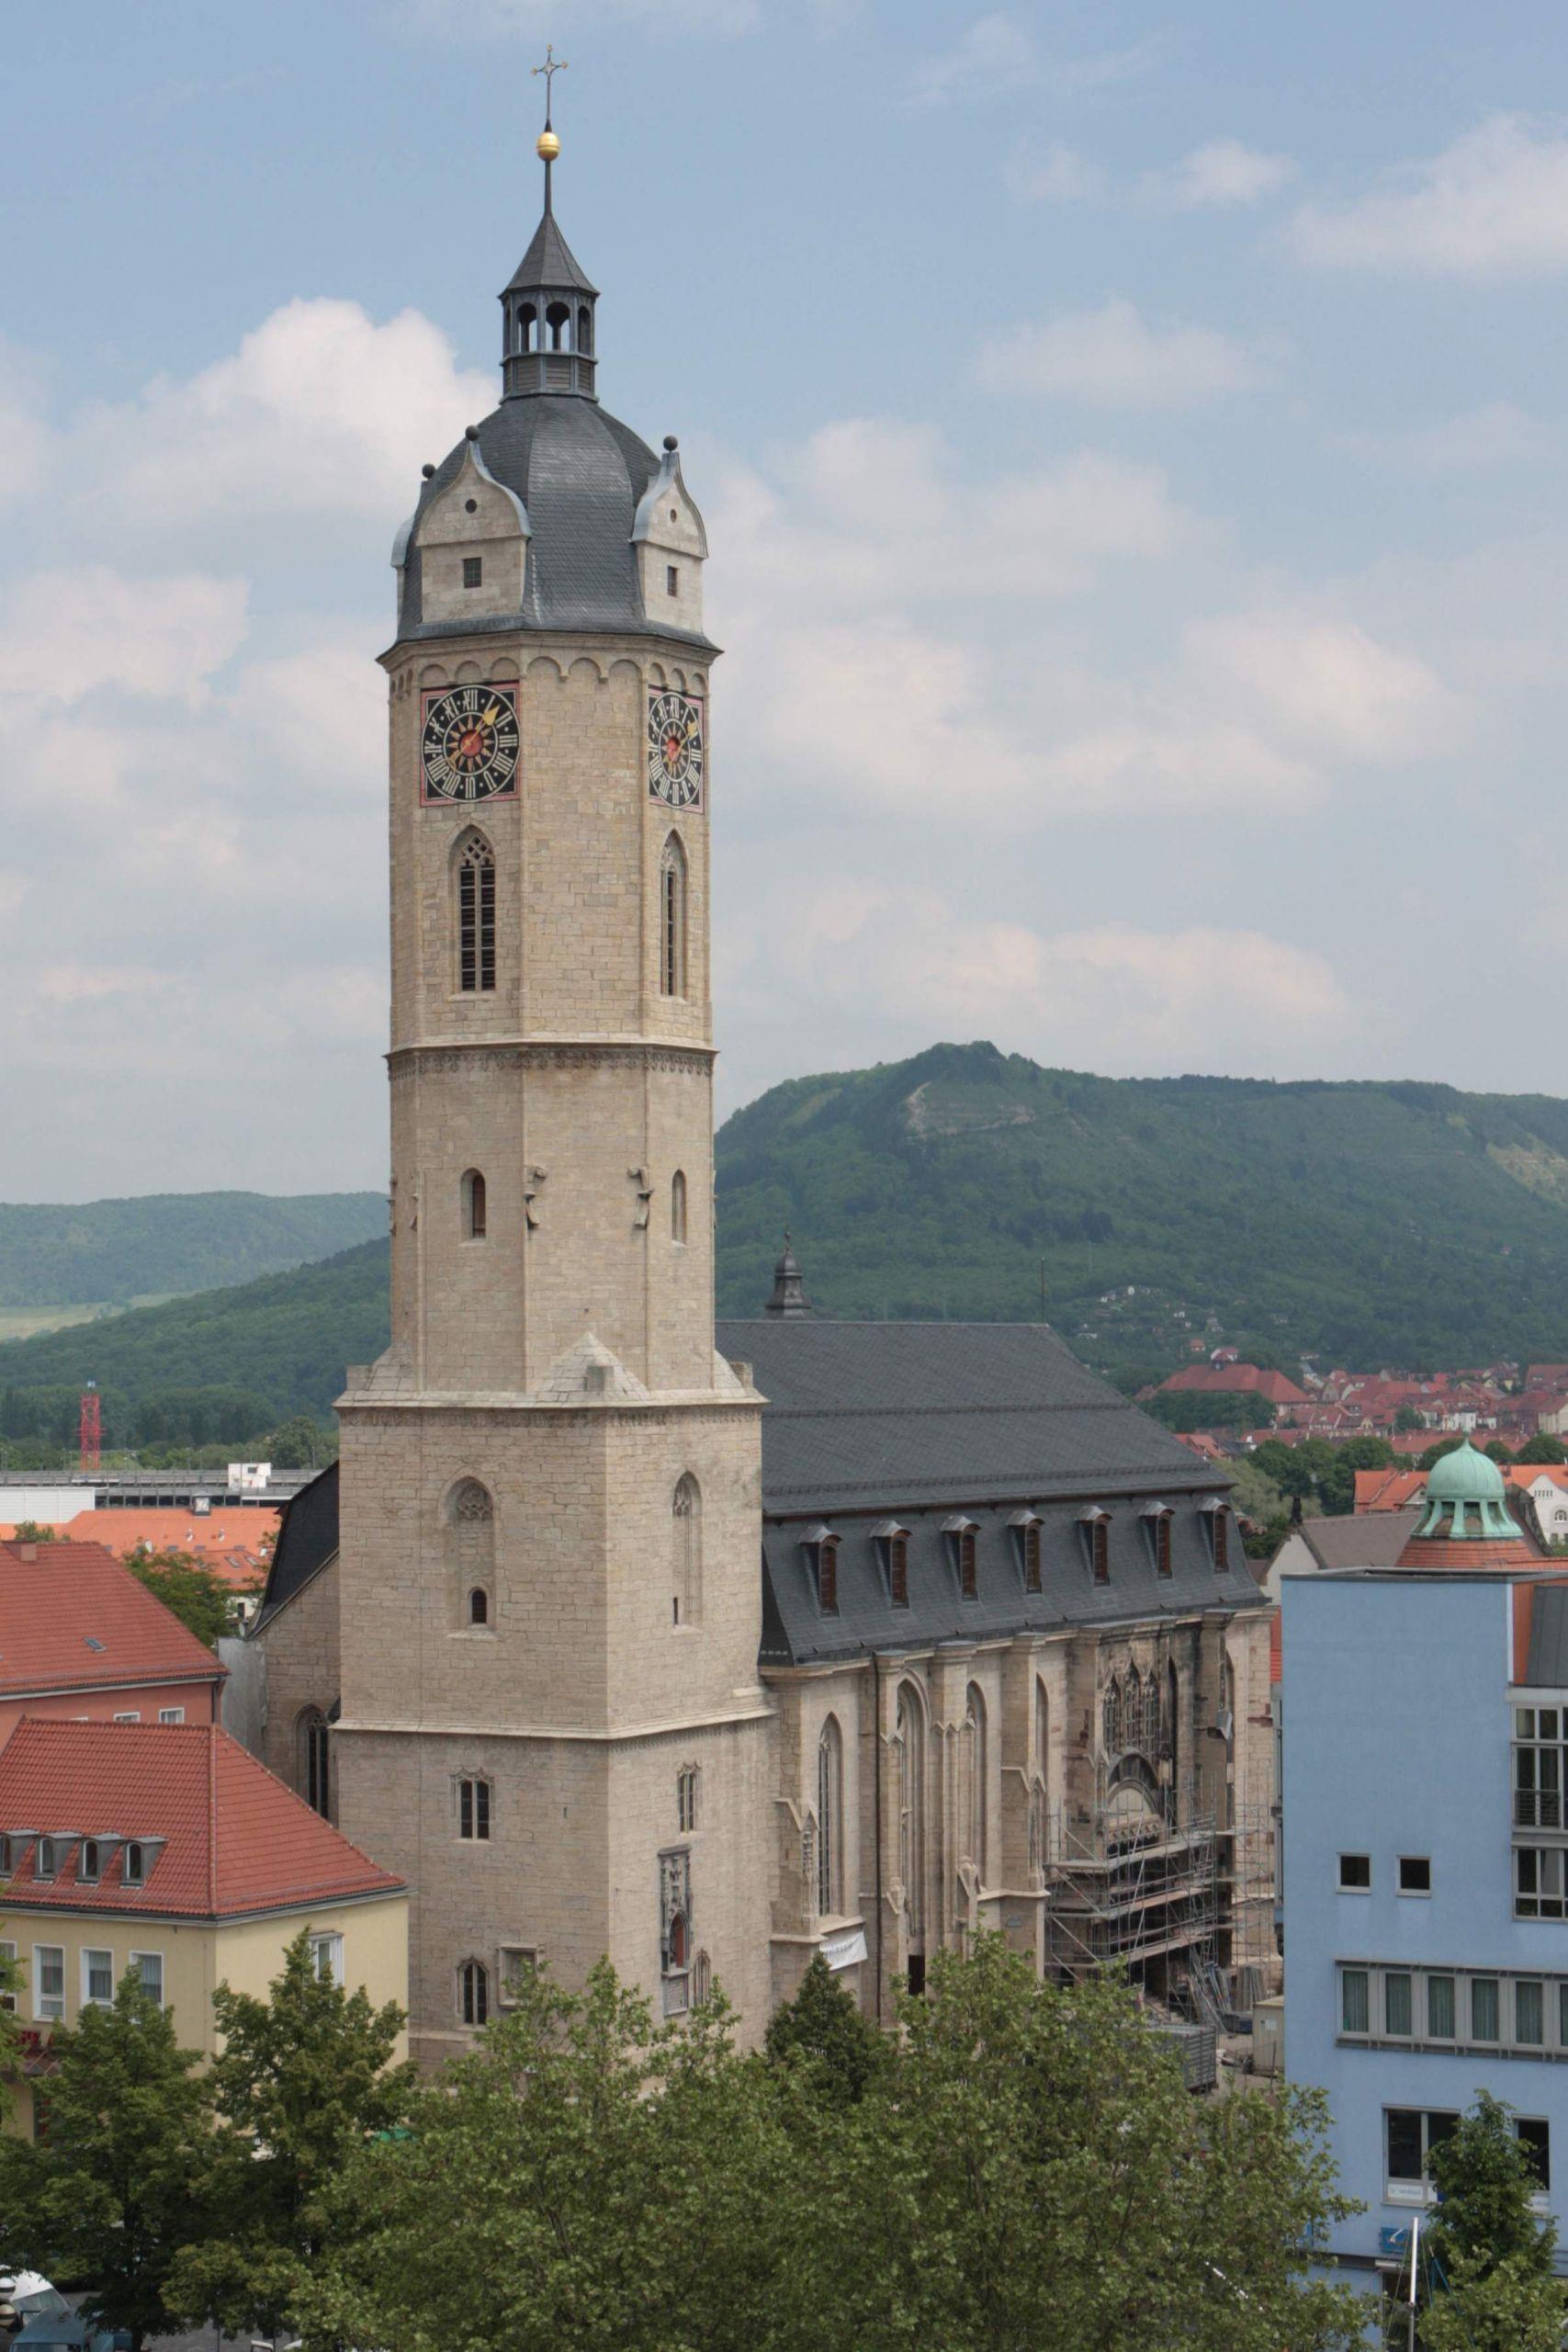 Stadtkirche St Michael in Jena 2008 05 24